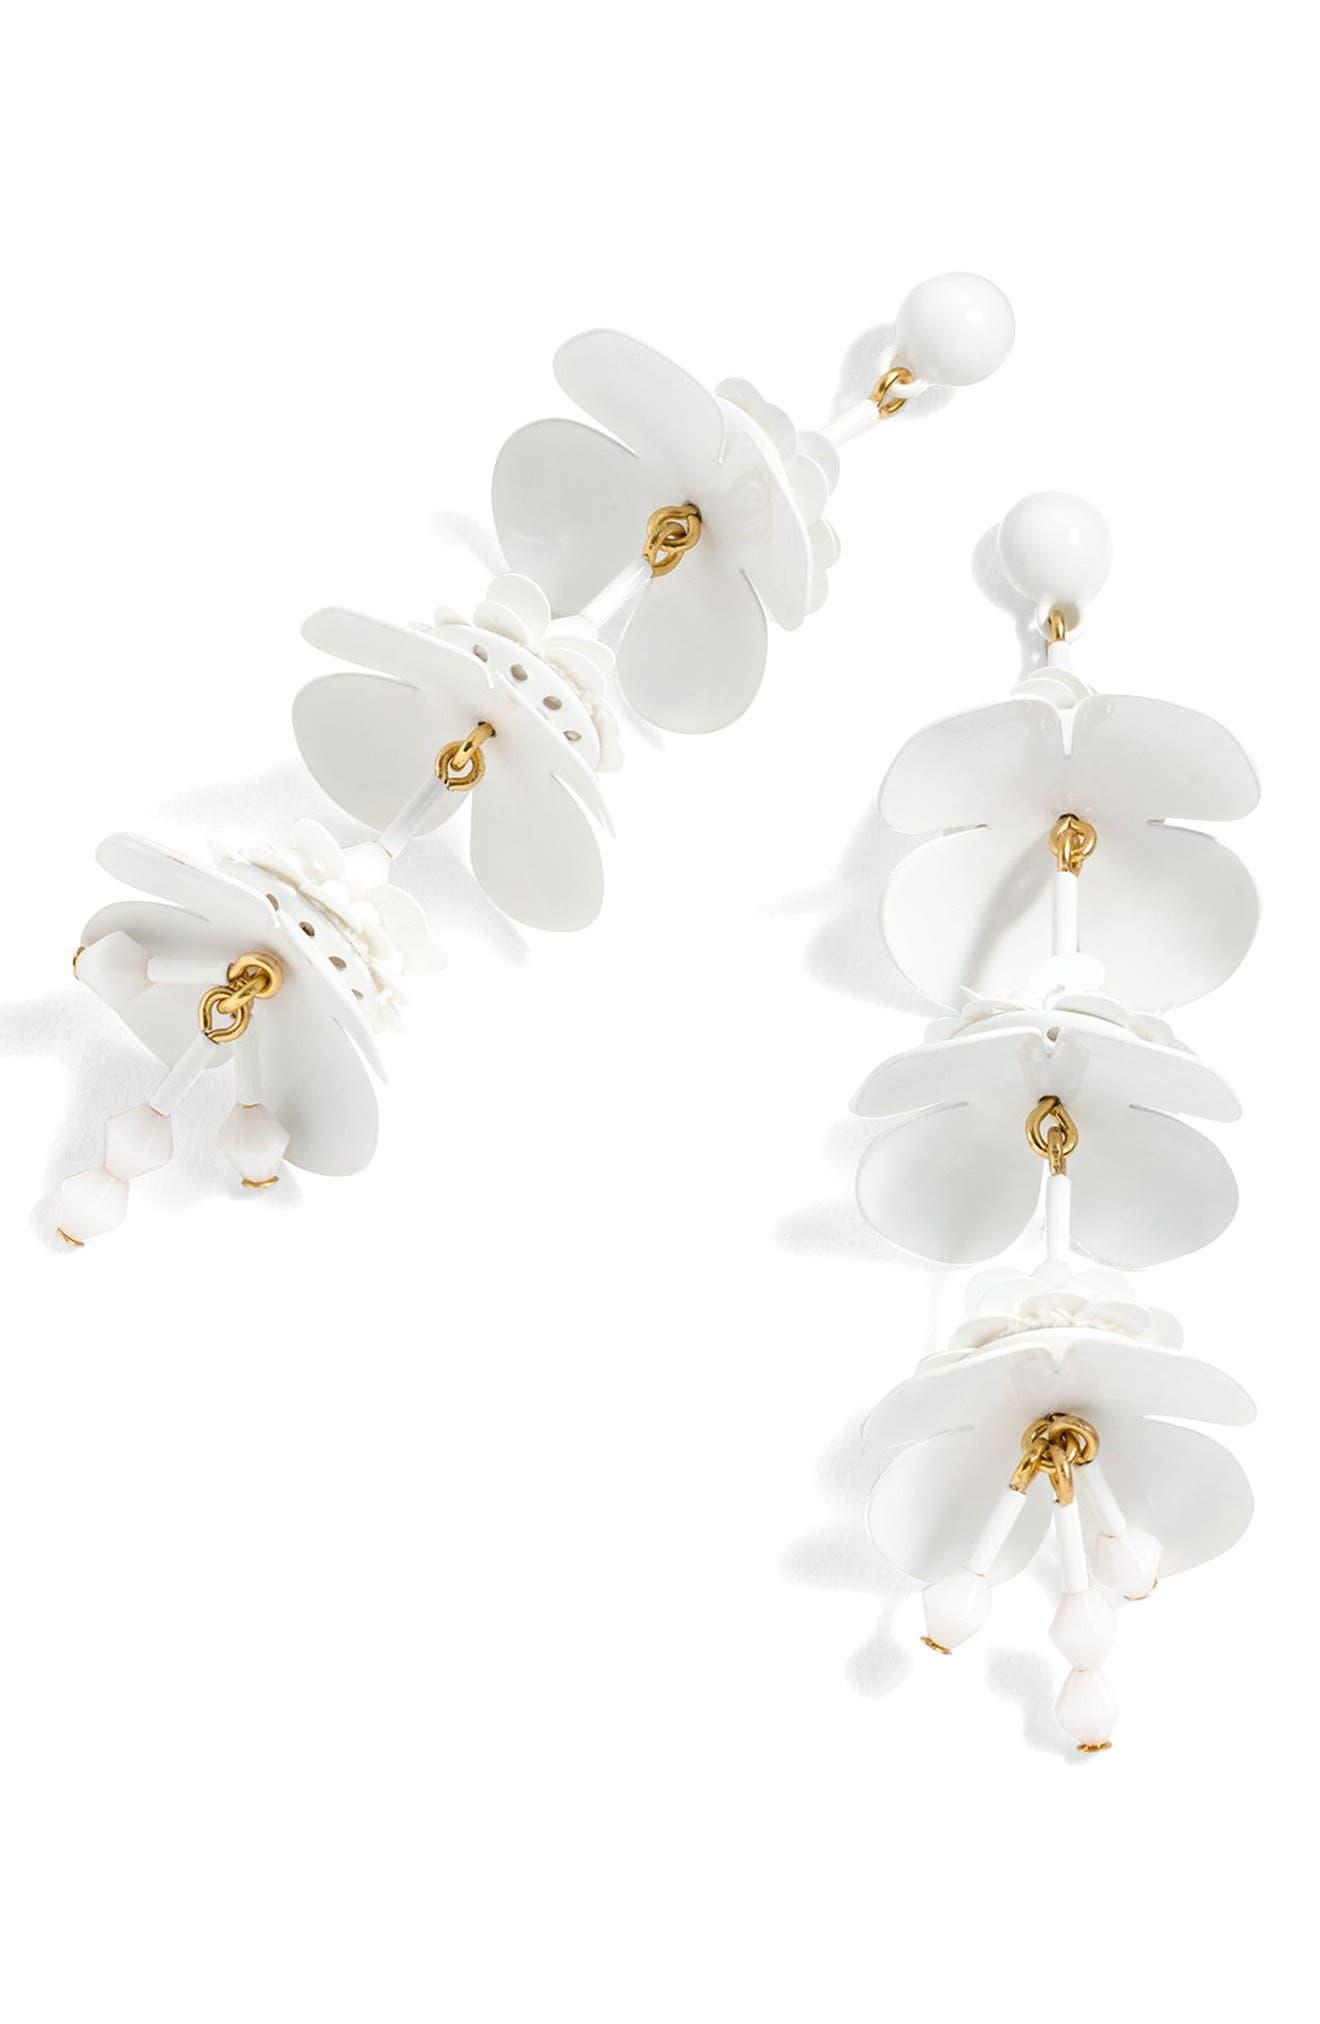 Bead & Blossom Earrings,                         Main,                         color, 100